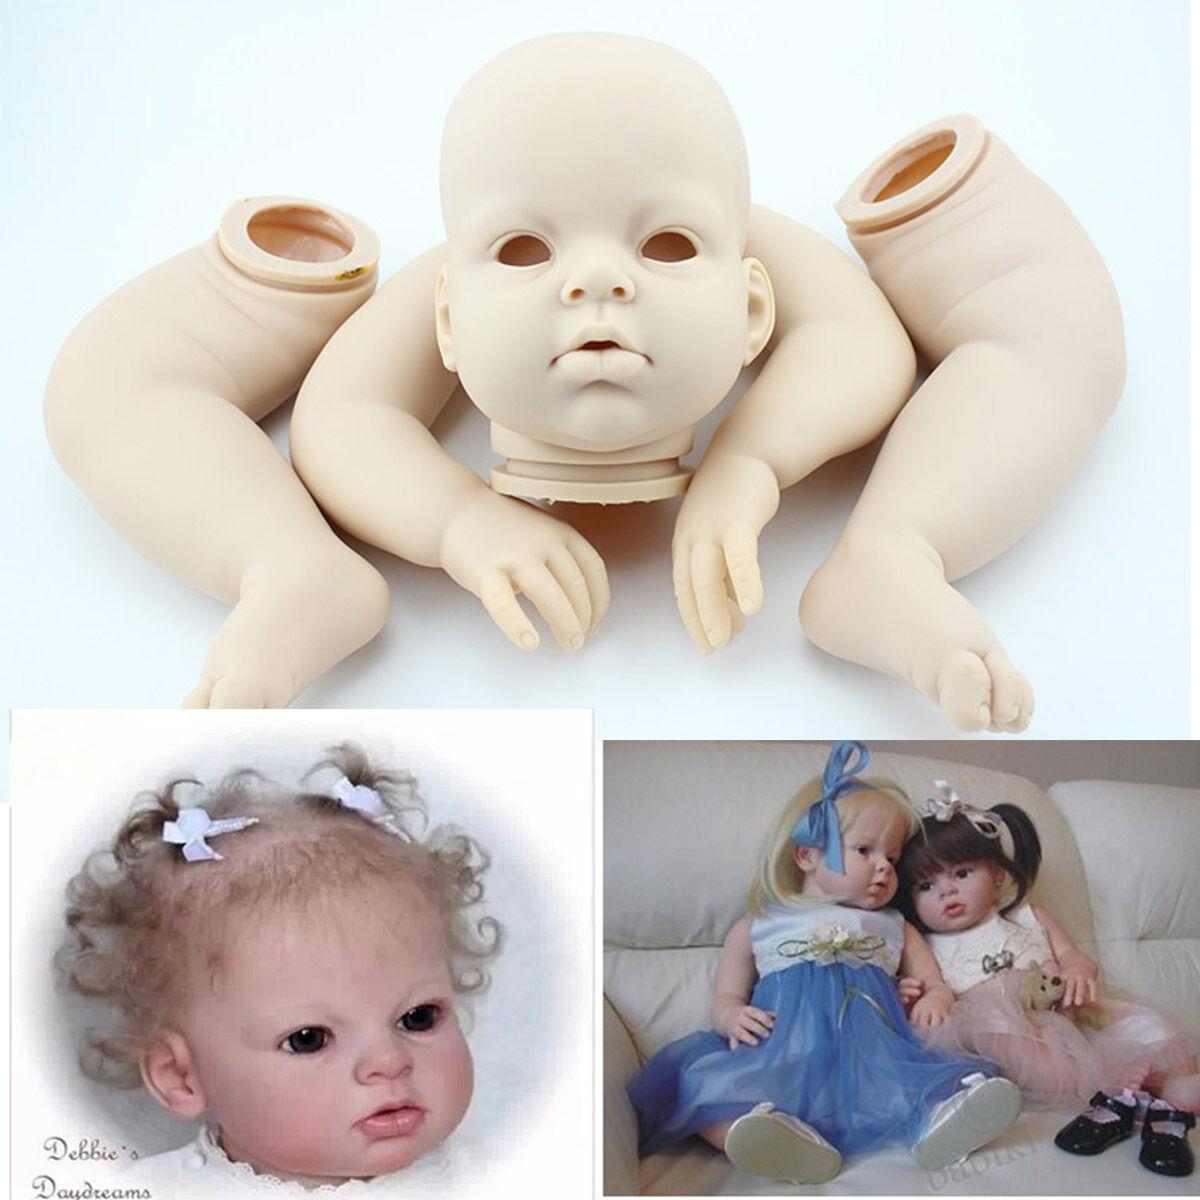 Reborn Dolls /& Supplies Arrianna Doll Kit for 28/'/'Lifelike Silicone Vinyl Reborn